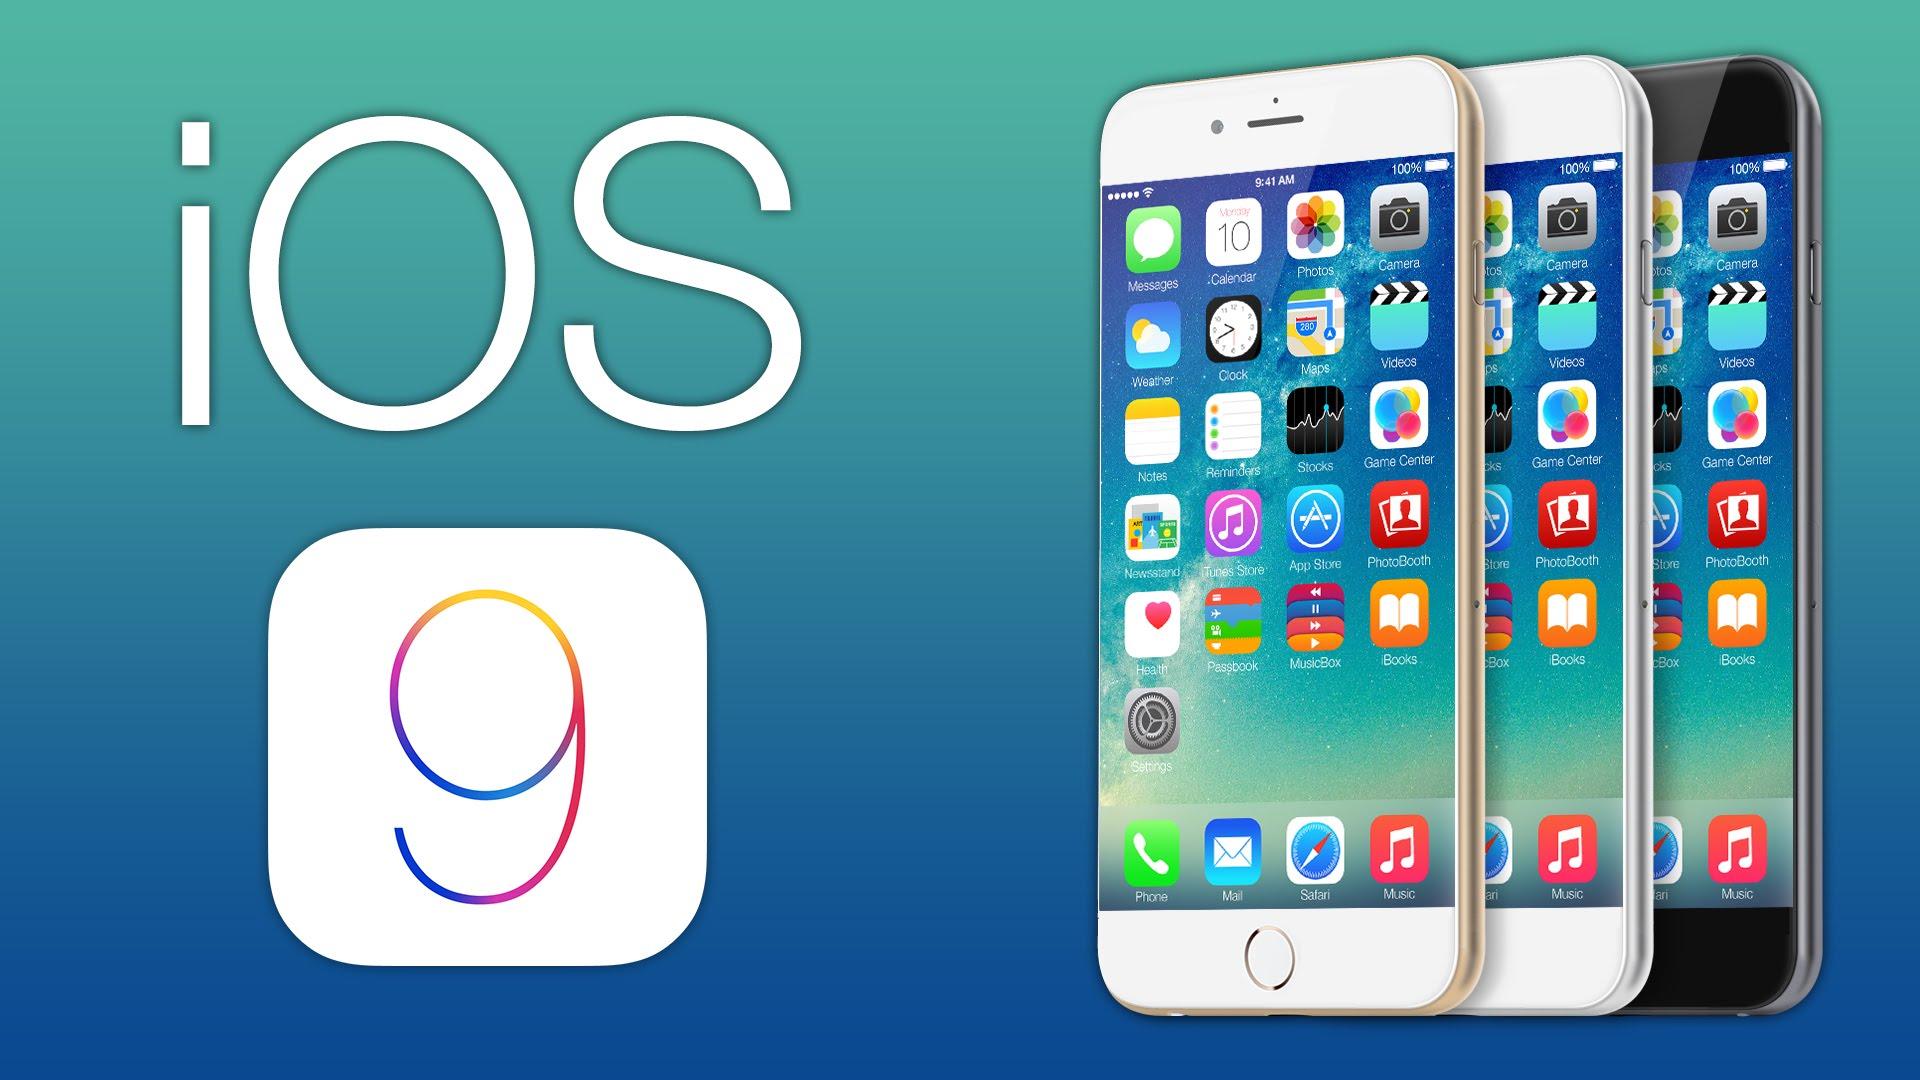 iOS 9 установлена на 75% активных iOS устройствах